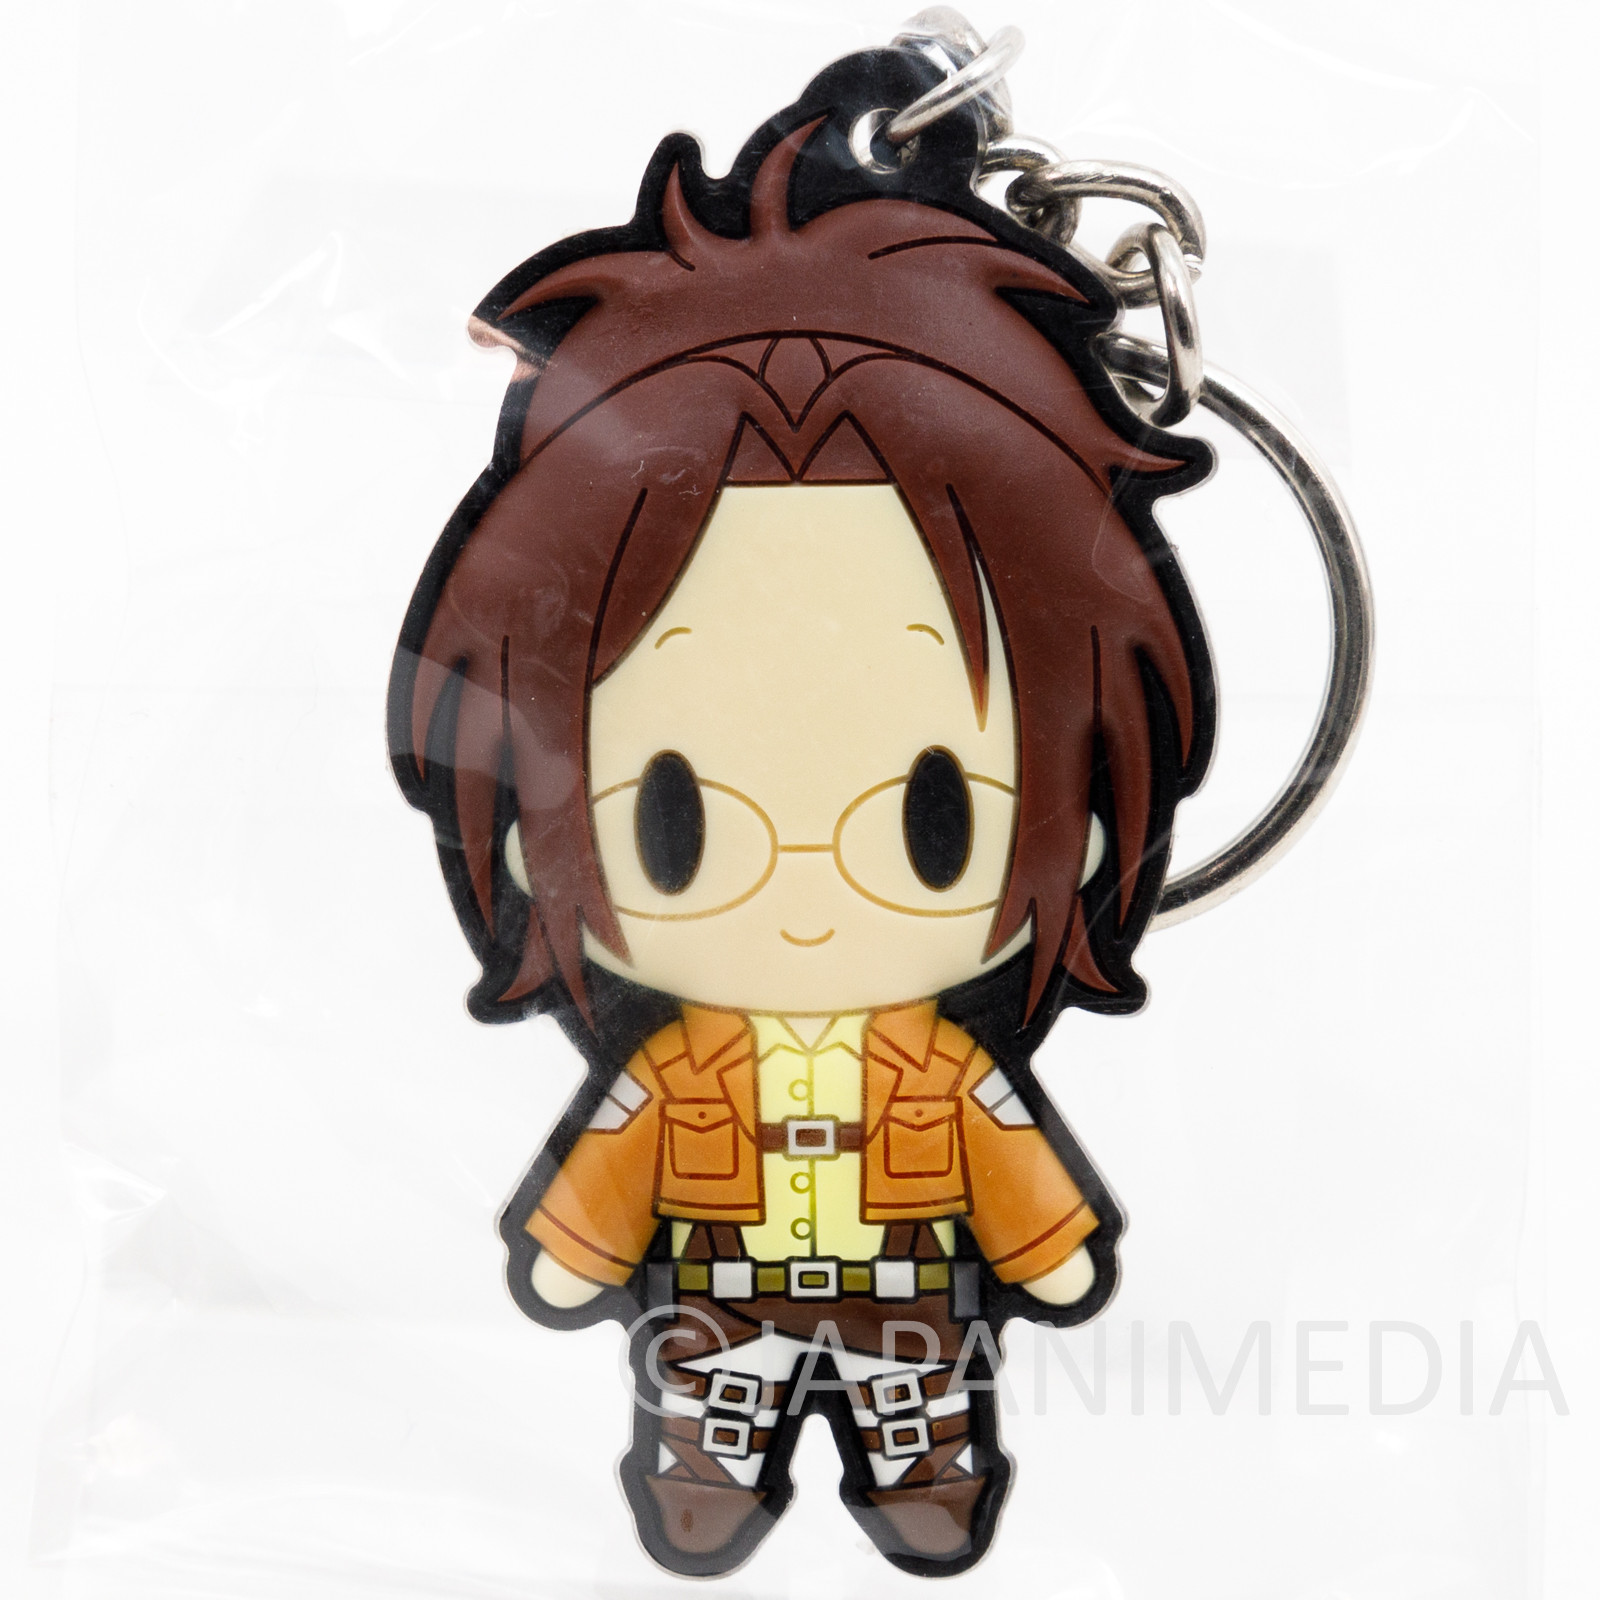 Attack on Titan Zoe Hange Rubber Mascot Keychain JAPAN ANIME